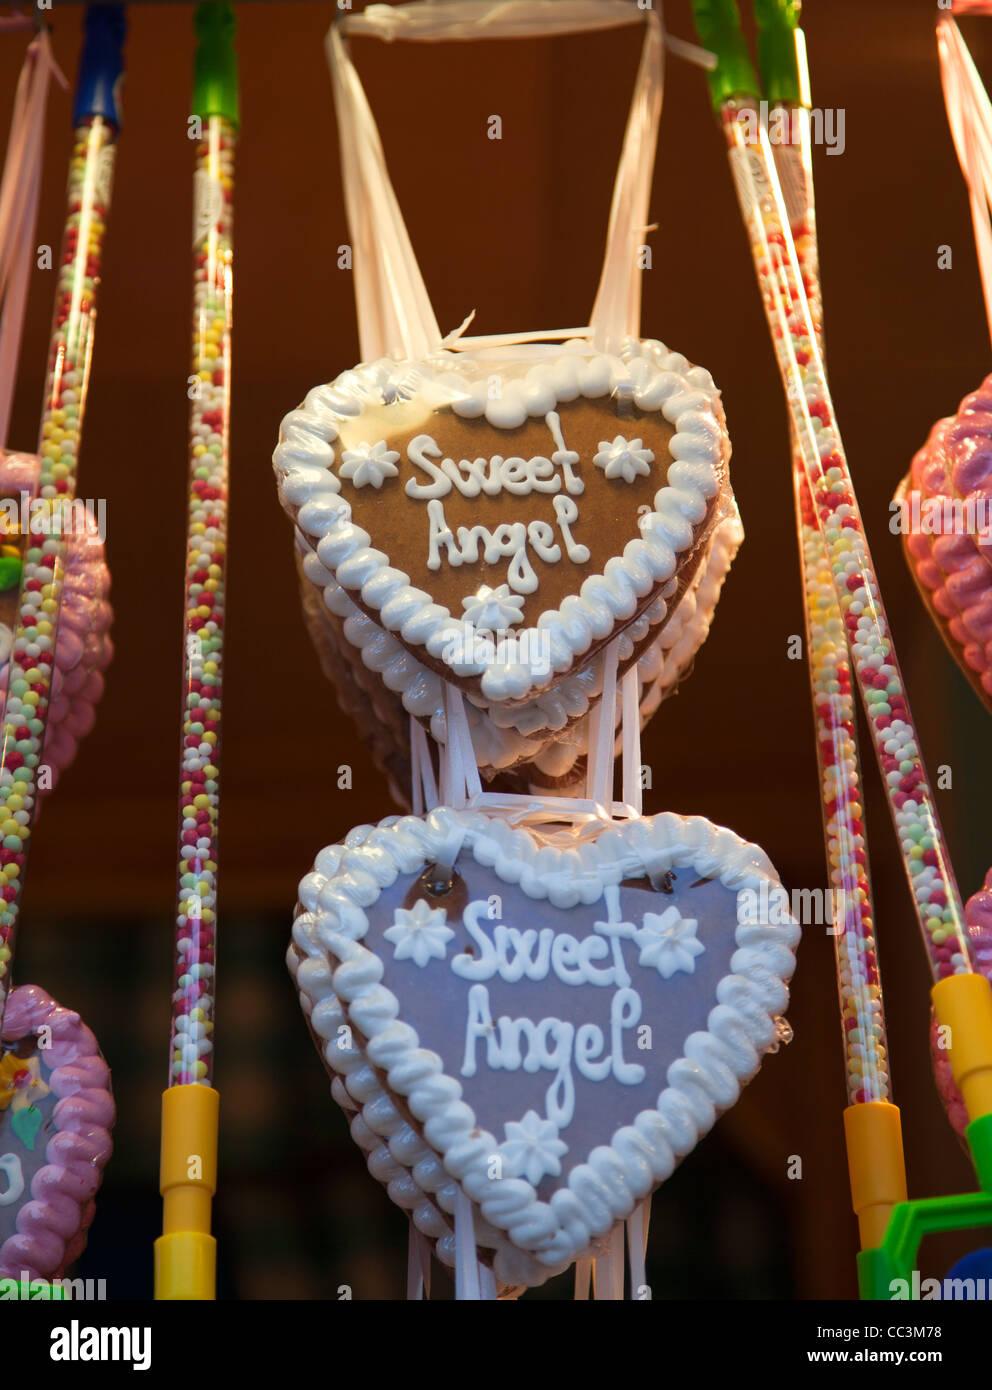 Süße Engel Lebkuchen Keks Herzen Stockfoto Bild 41878348 Alamy